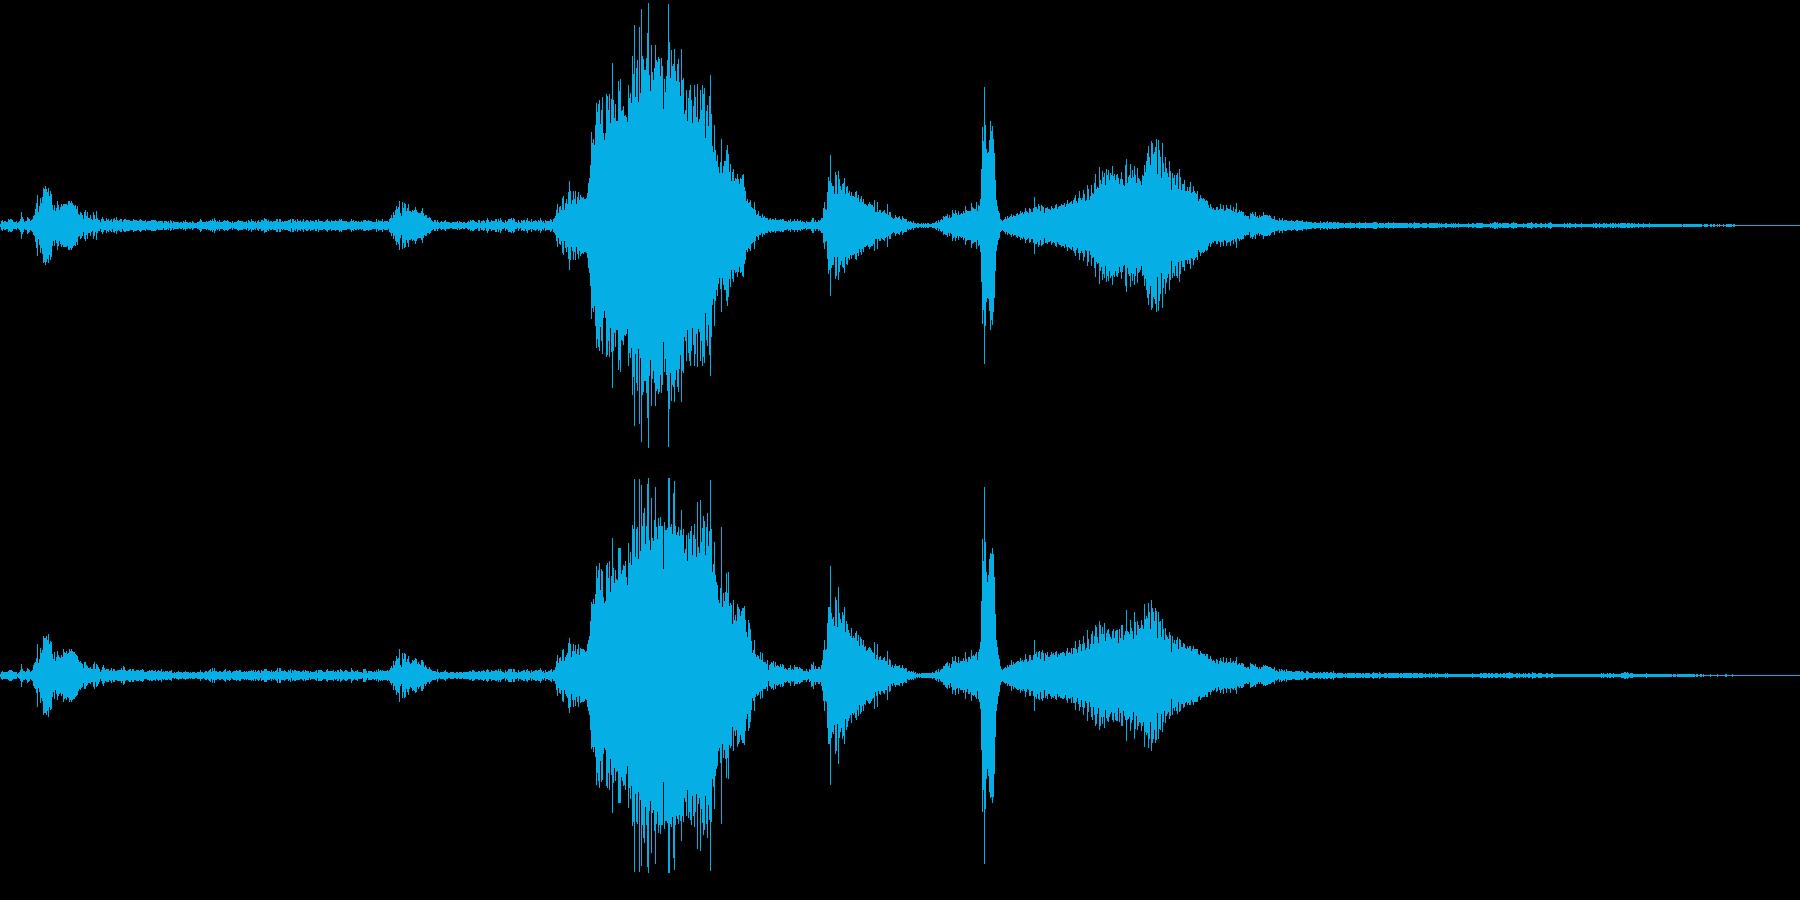 EXT:スタート、アイドル、ピール...の再生済みの波形